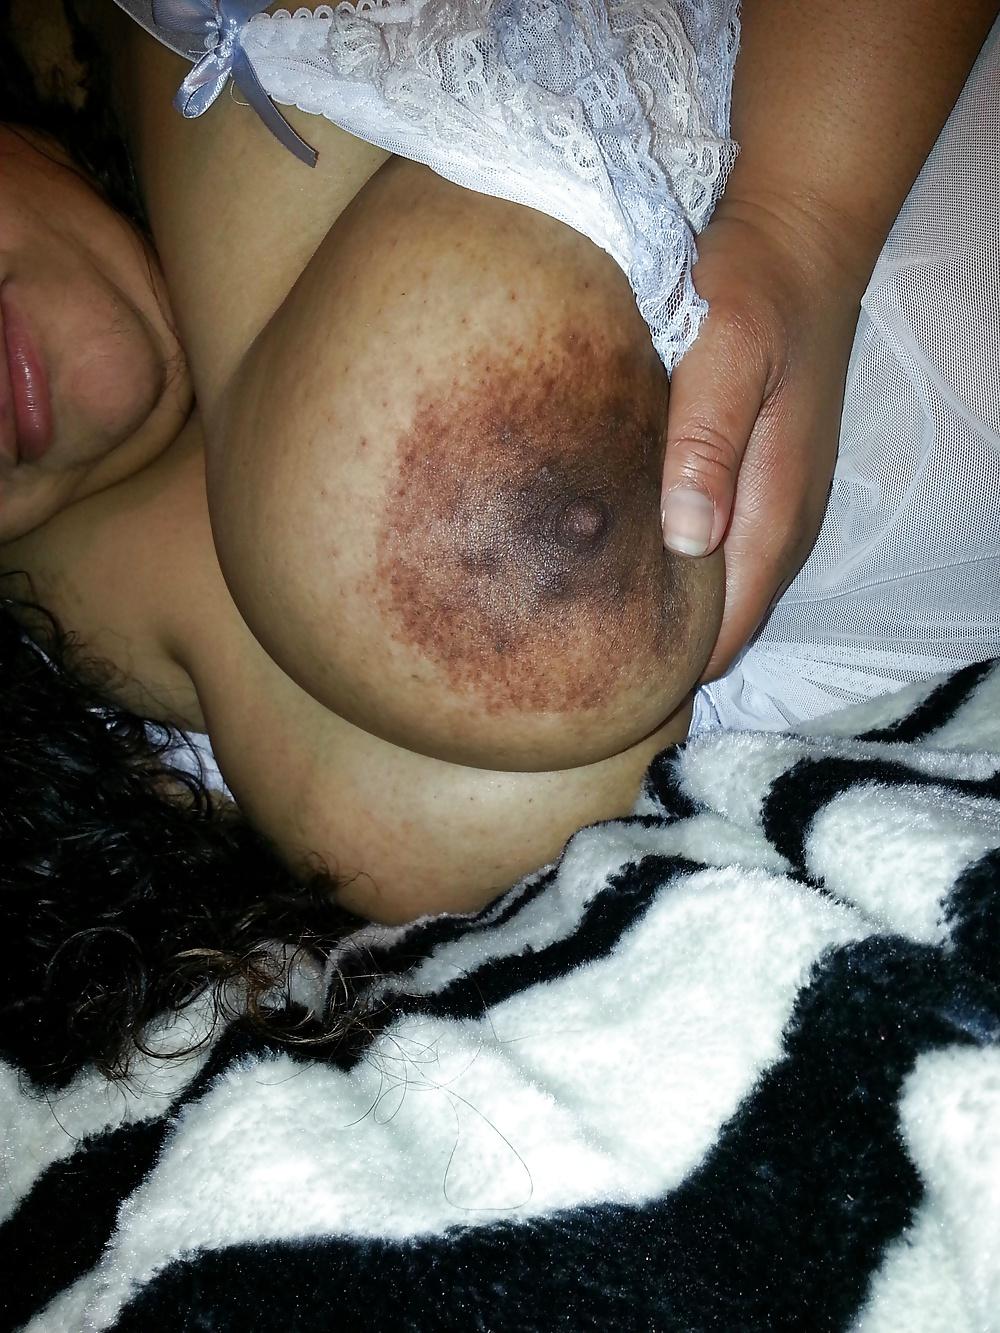 Fucked her last night